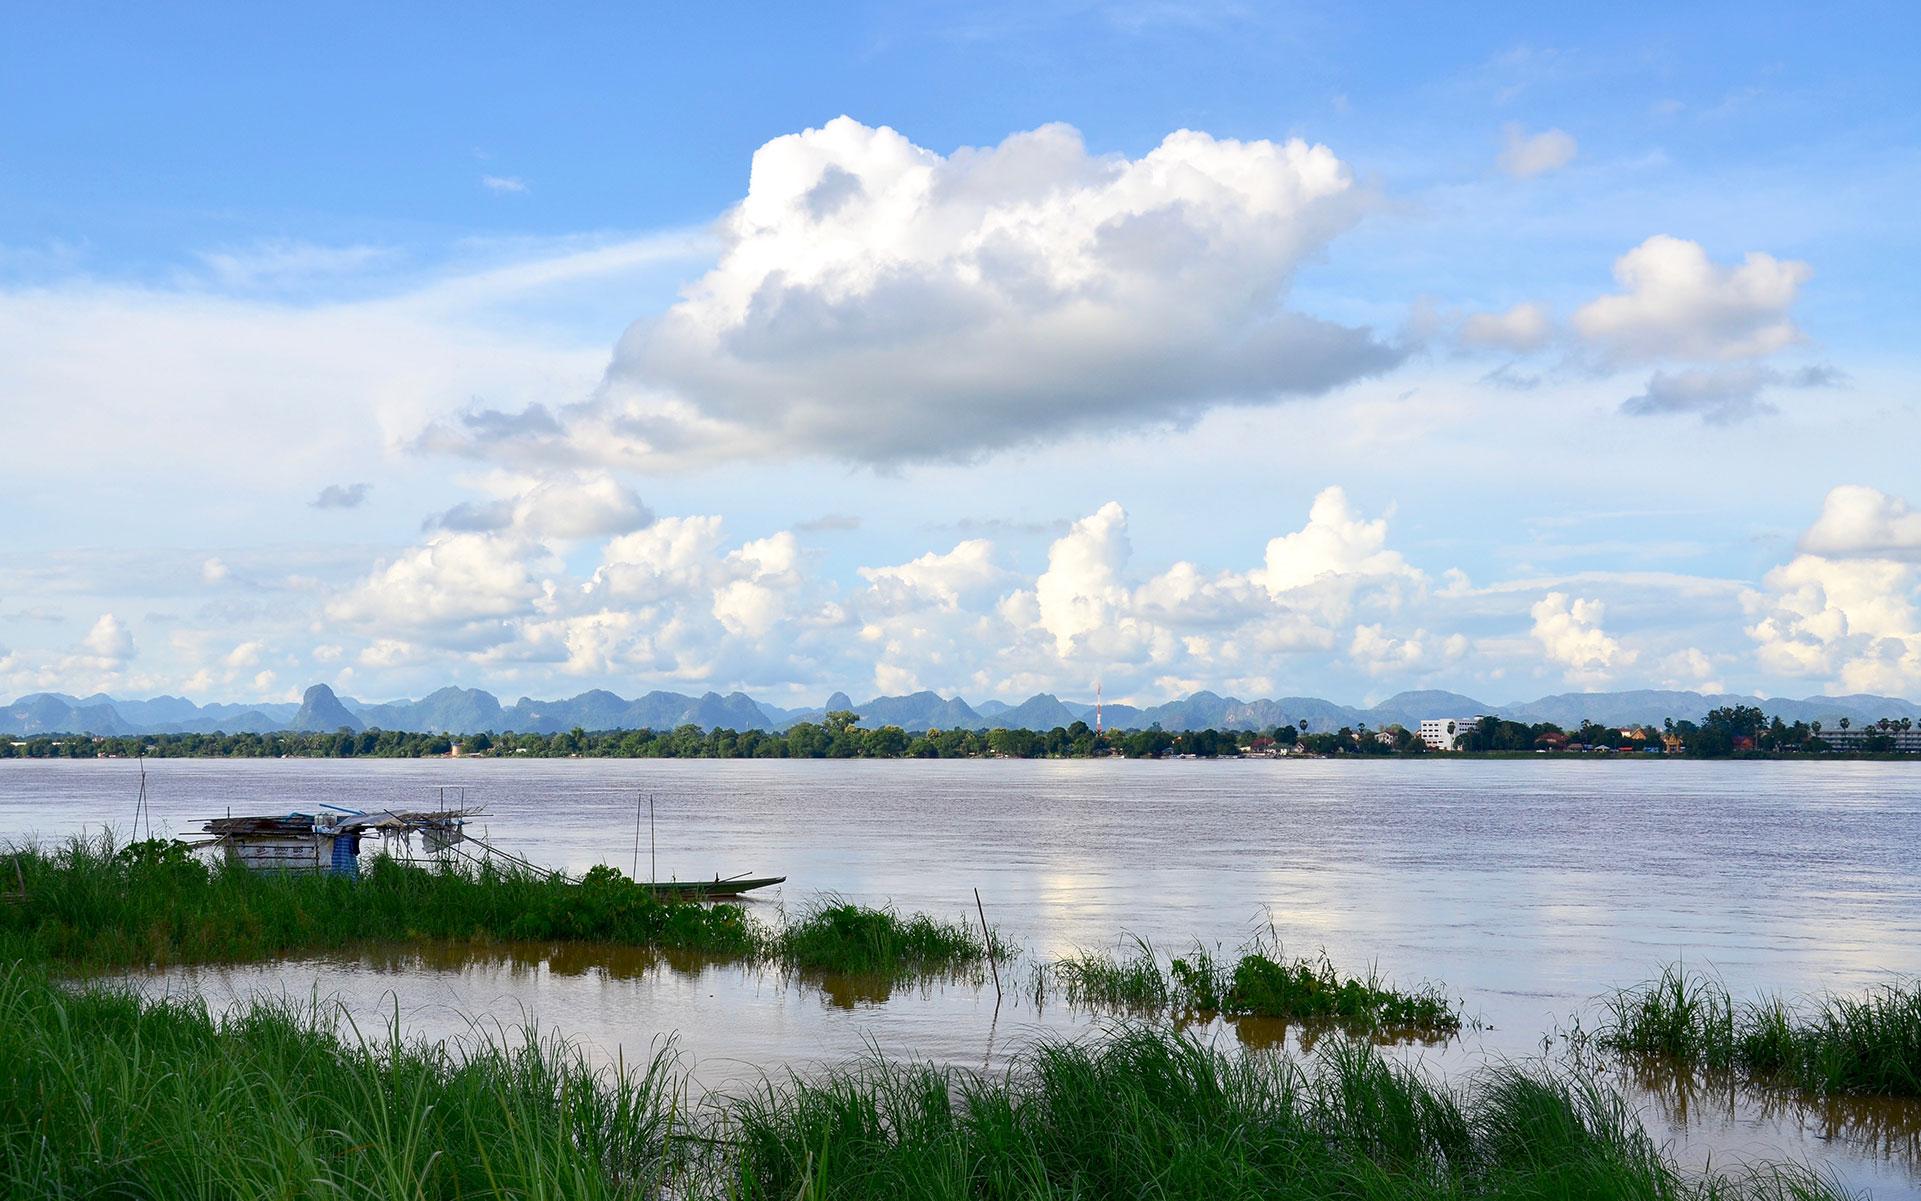 mekong river thai stick production hub